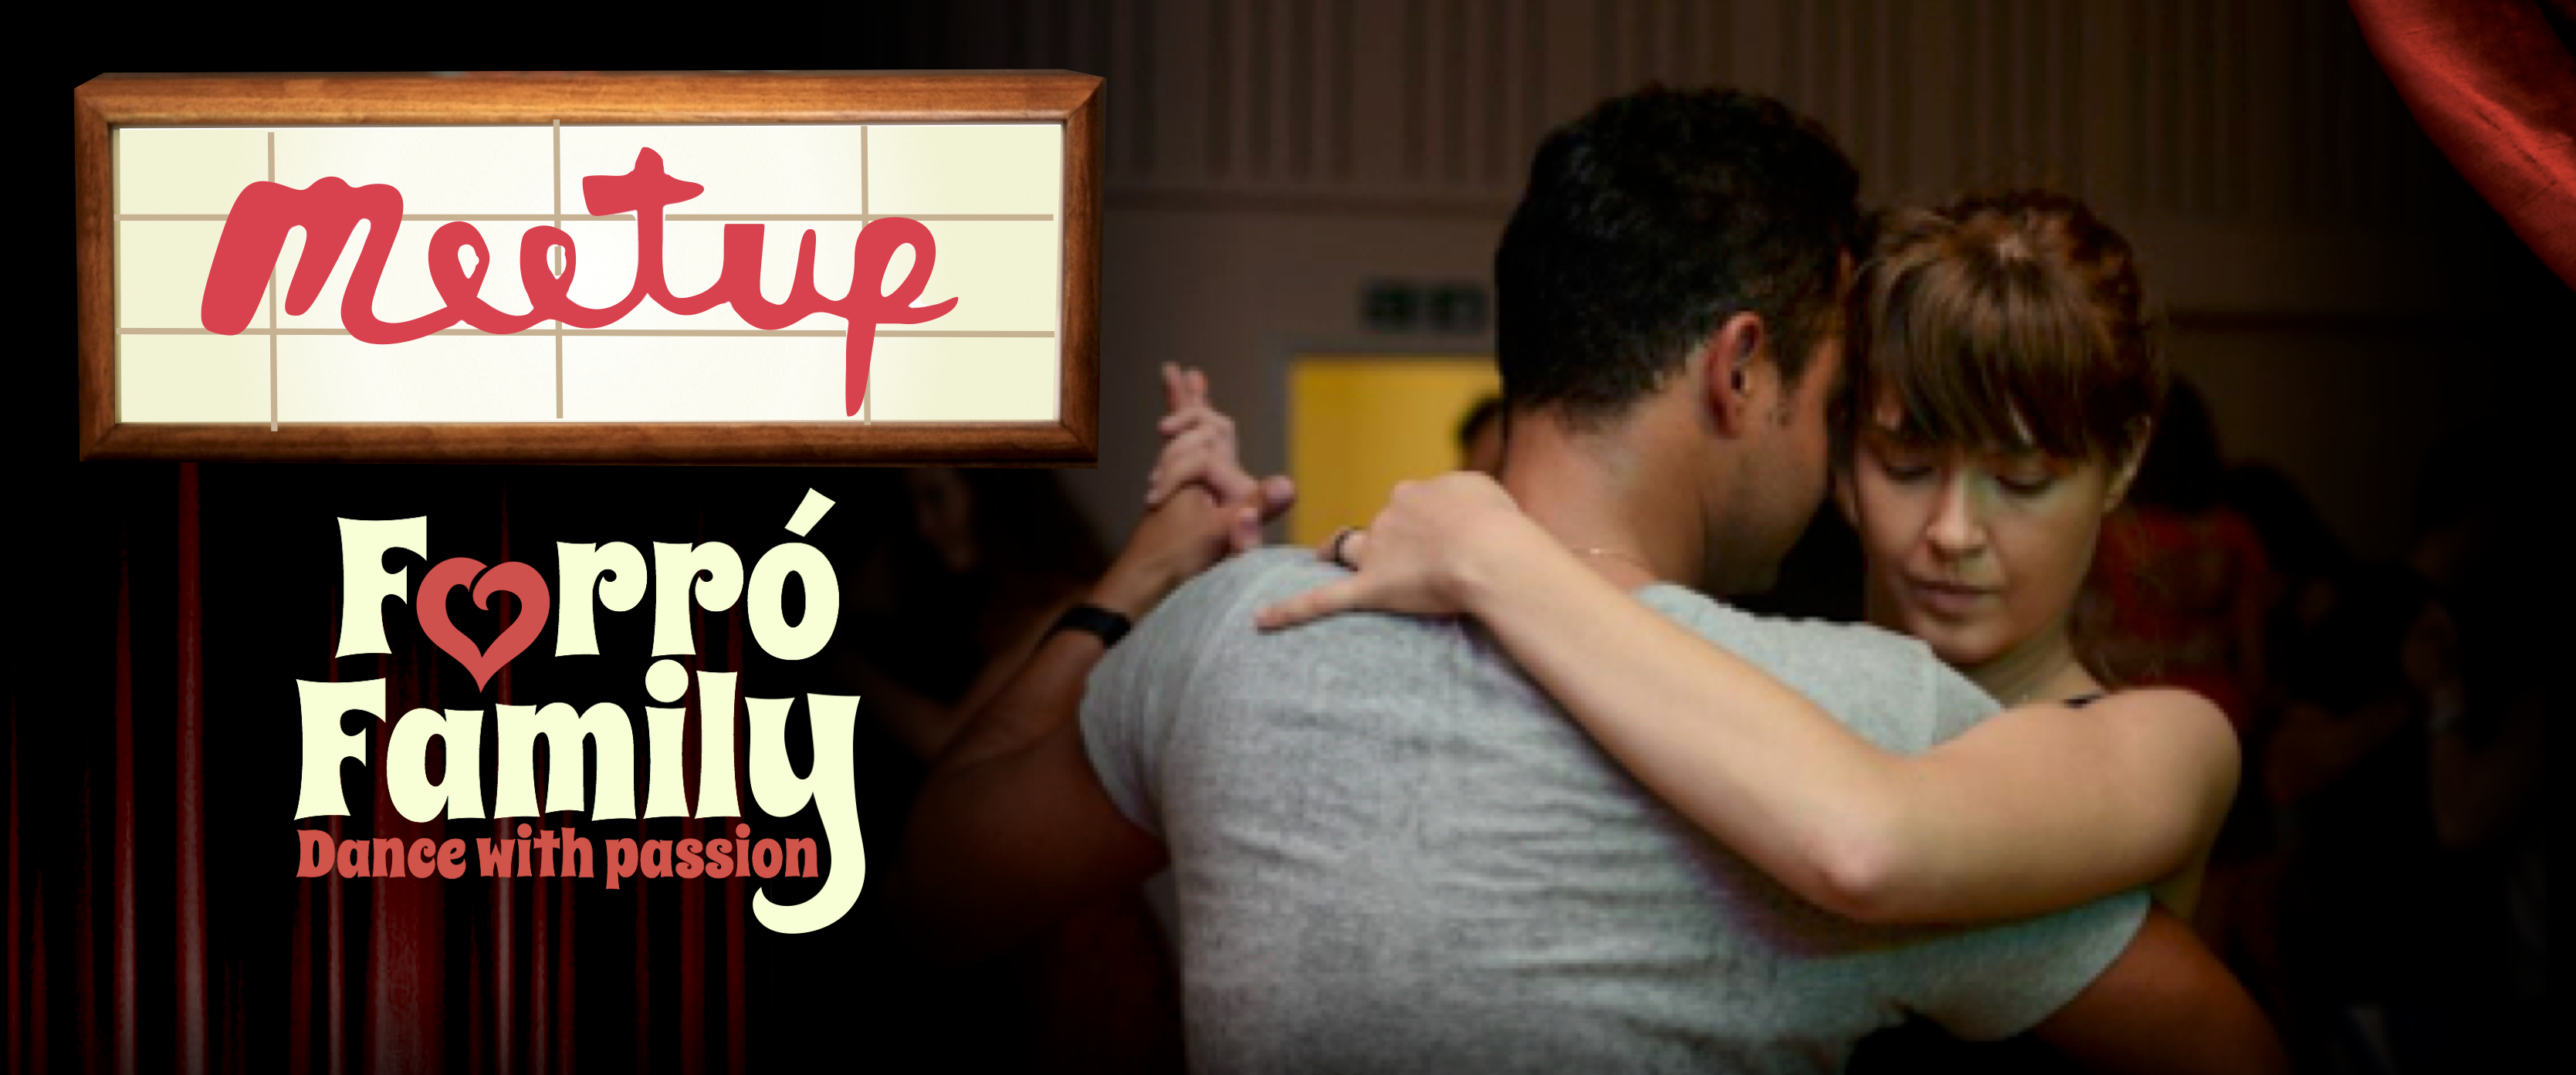 Learn to dance at Forro Family - Brazilian Partner Dance